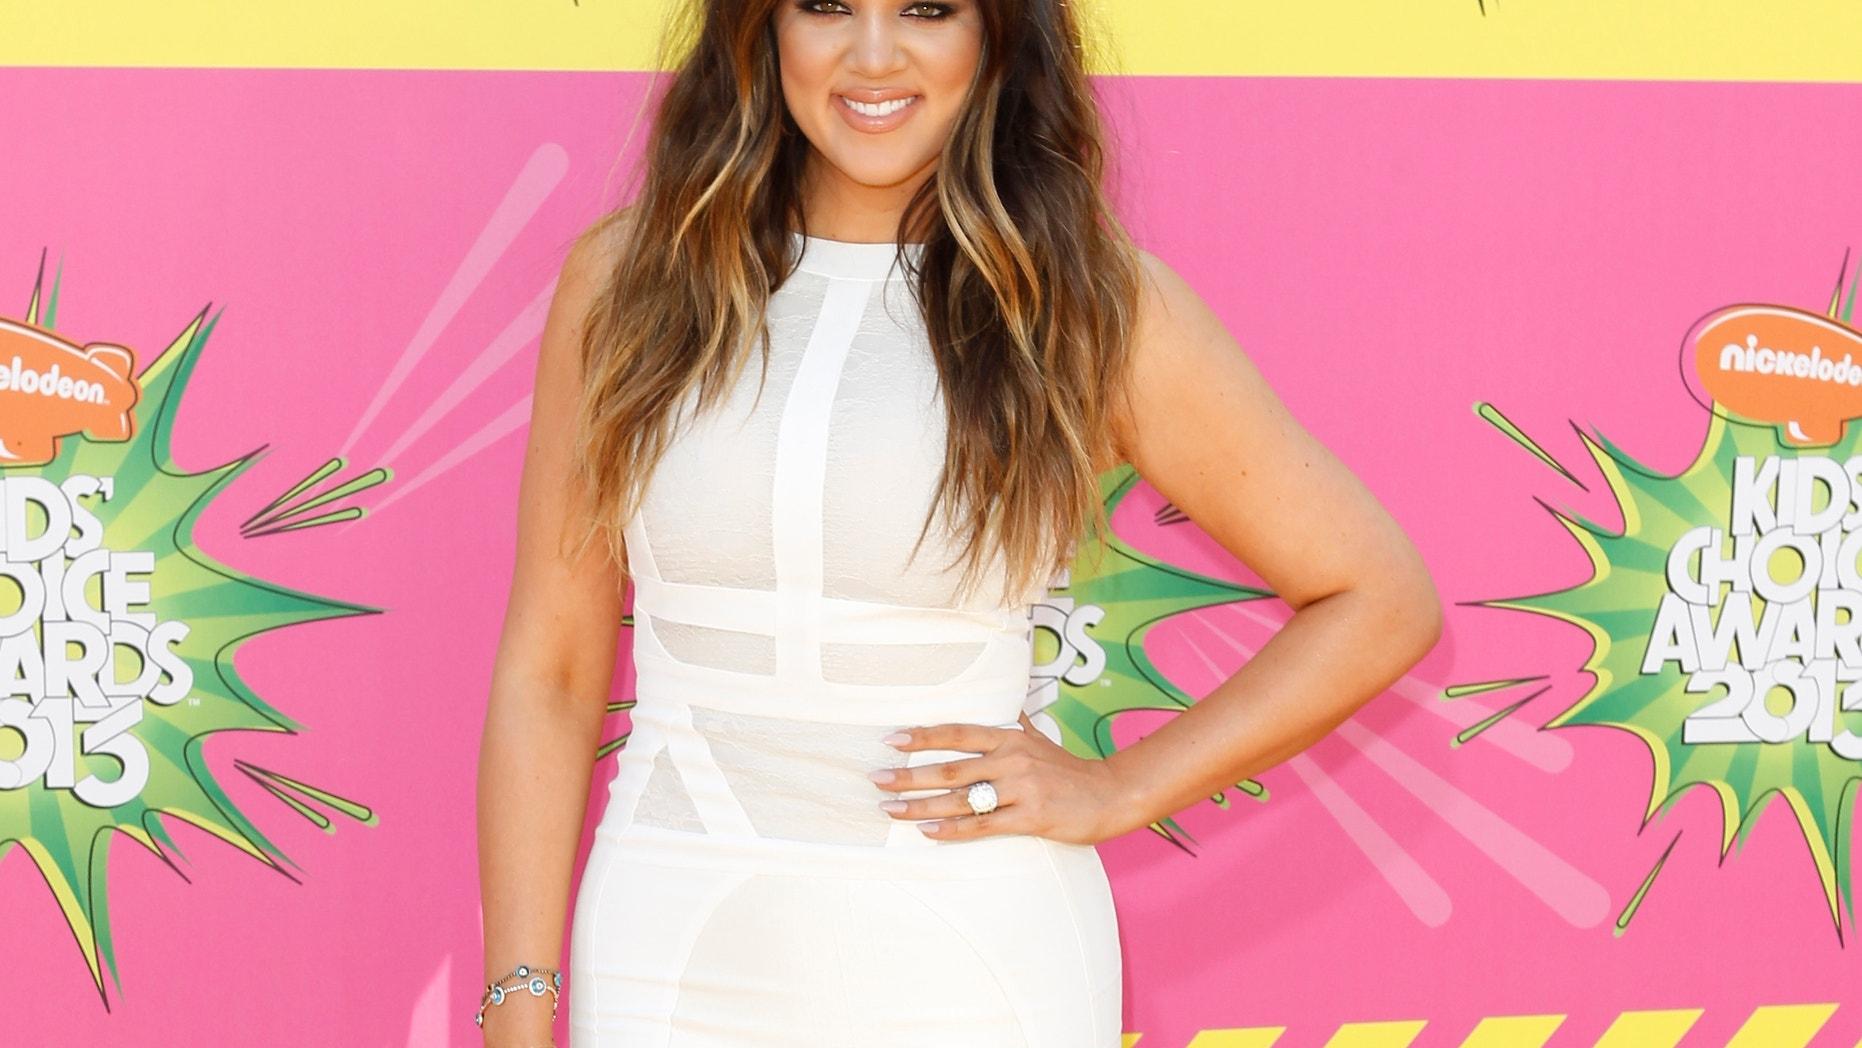 Actress Khloe Kardashian arrives at the 2013 Kids Choice Awards in Los Angeles, California March 23, 2013.